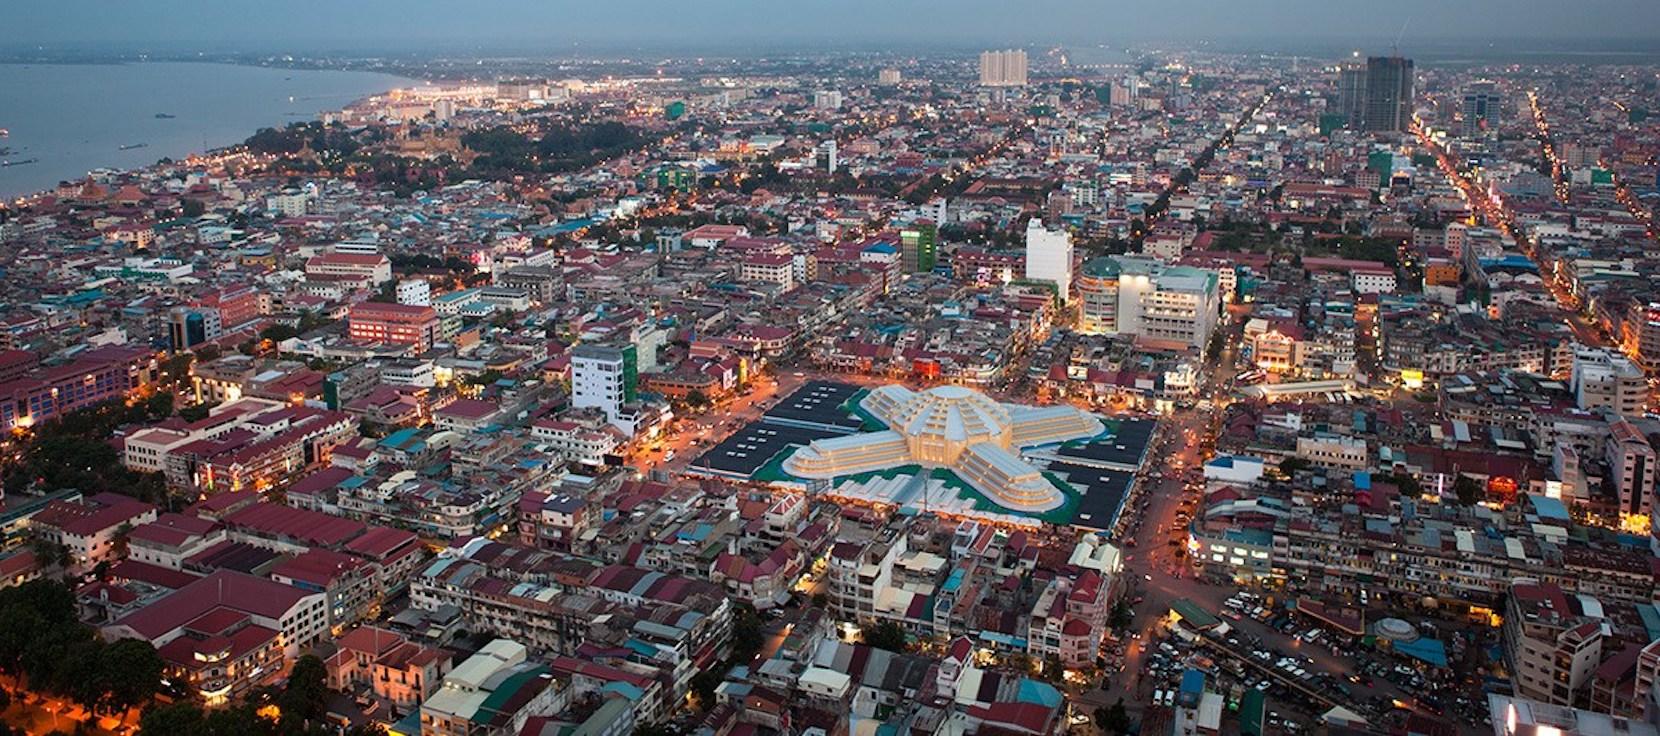 4 Day Phnom Penh Free & Easy (Luxury) 01/04/18 <> 15/09/18